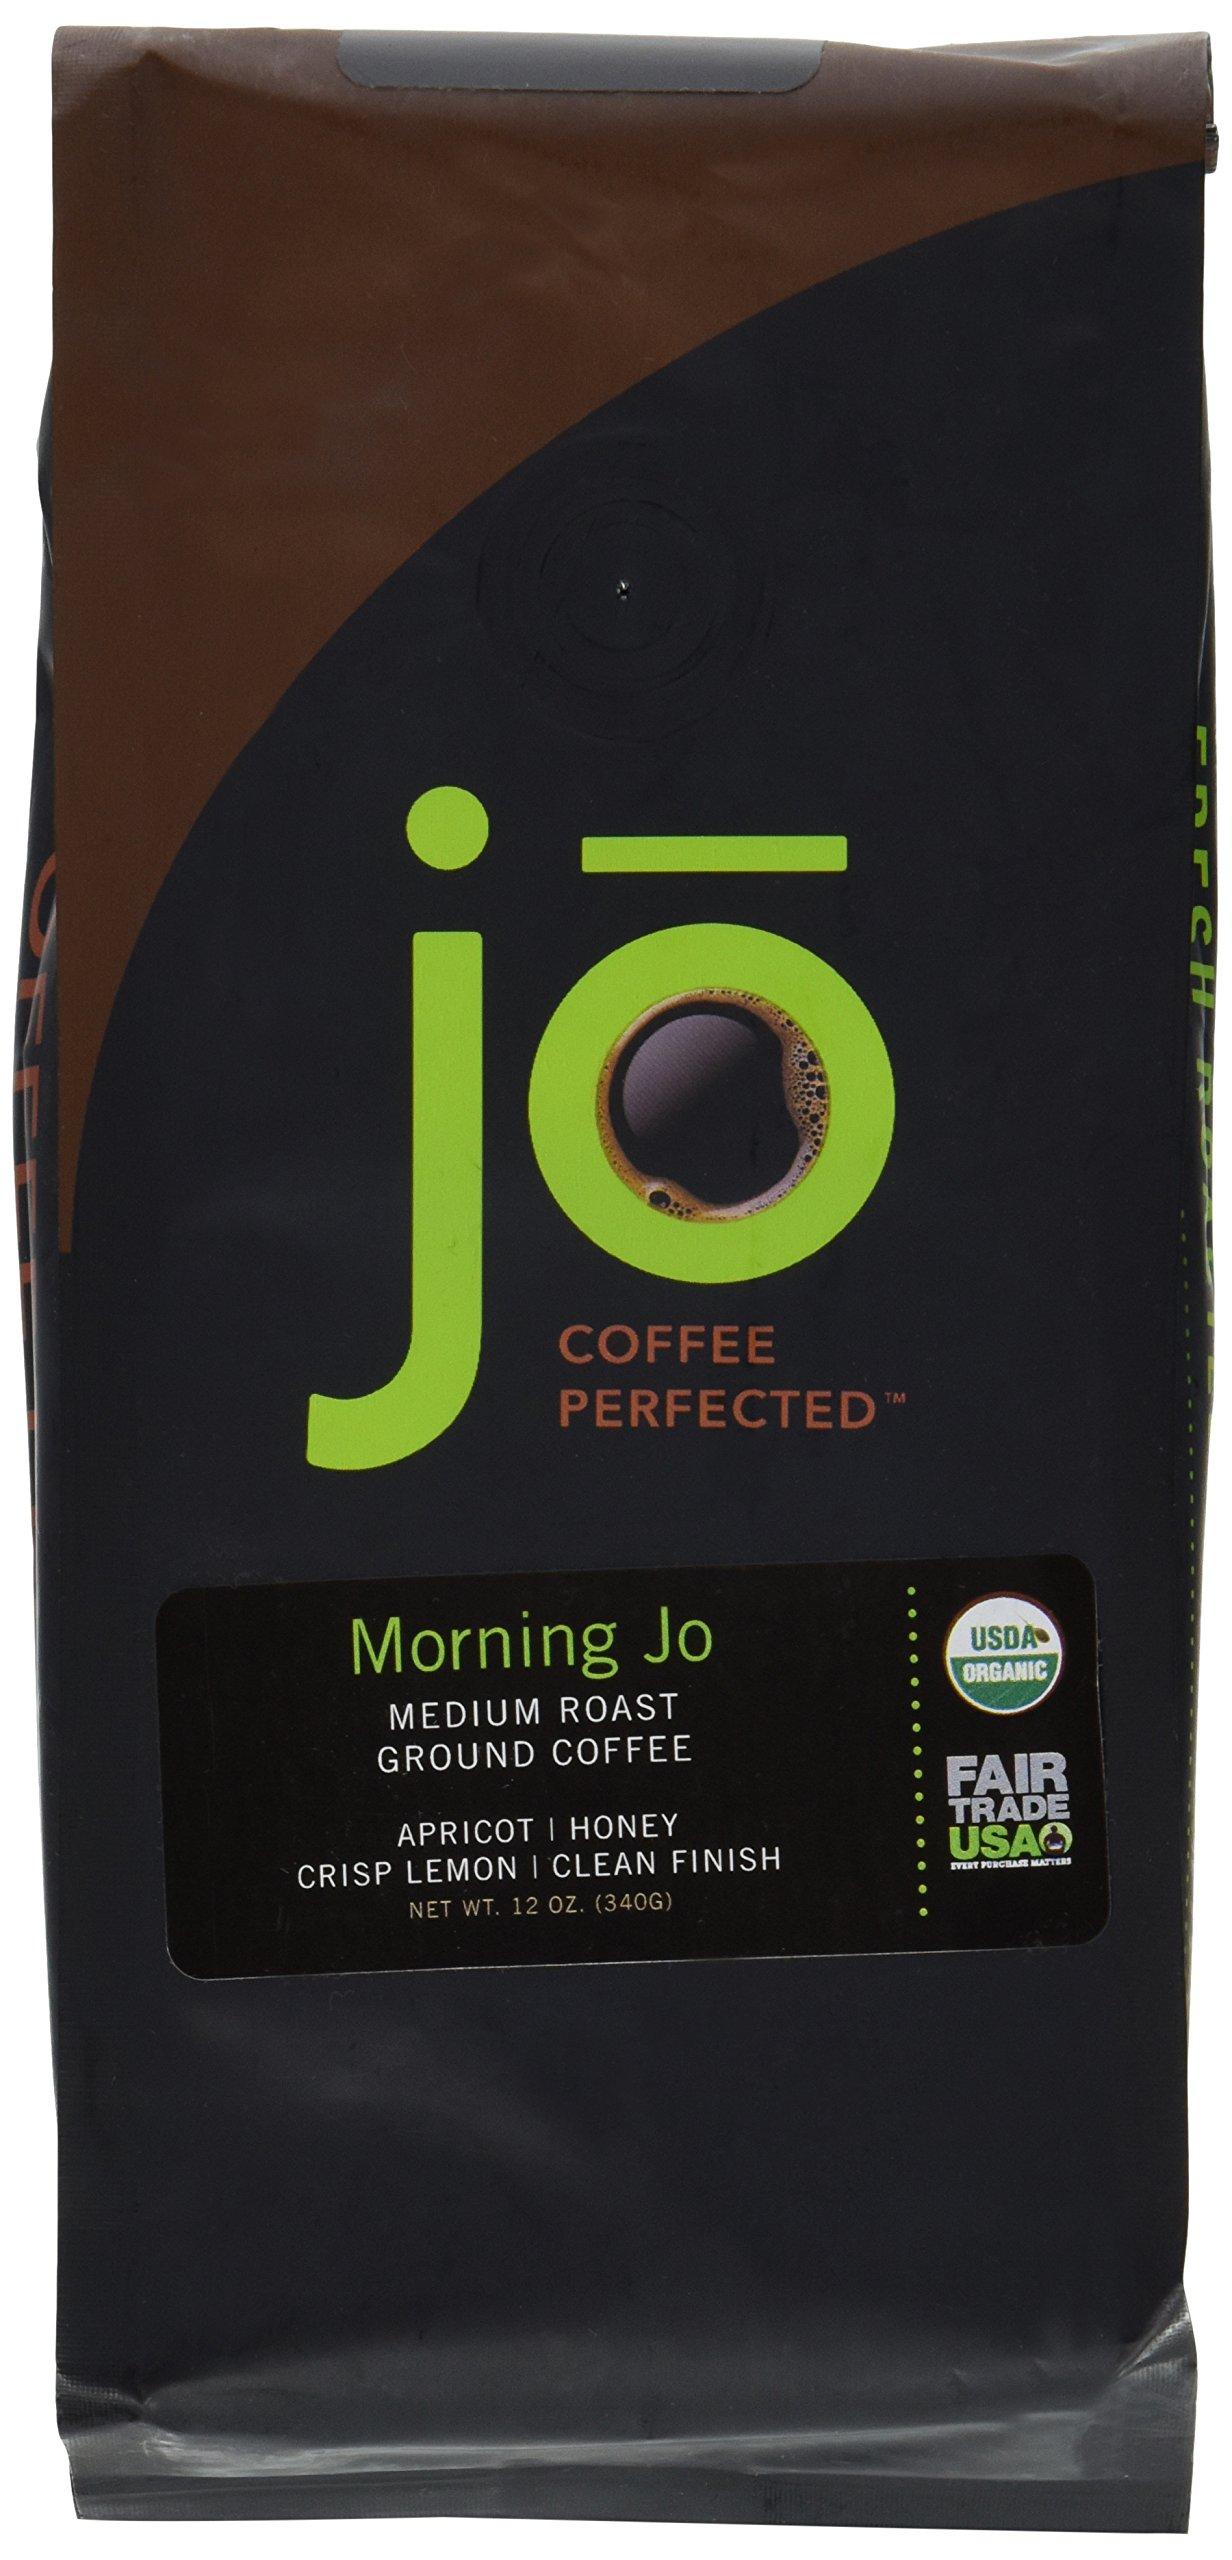 MORNING JO: 12 oz, Organic Breakfast Blend Ground Coffee, Medium Roast, Fair Trade Certified, USDA Certified Organic, NON-GMO, 100% Arabica Coffee, Gourmet Coffee from the Jo Coffee Collection